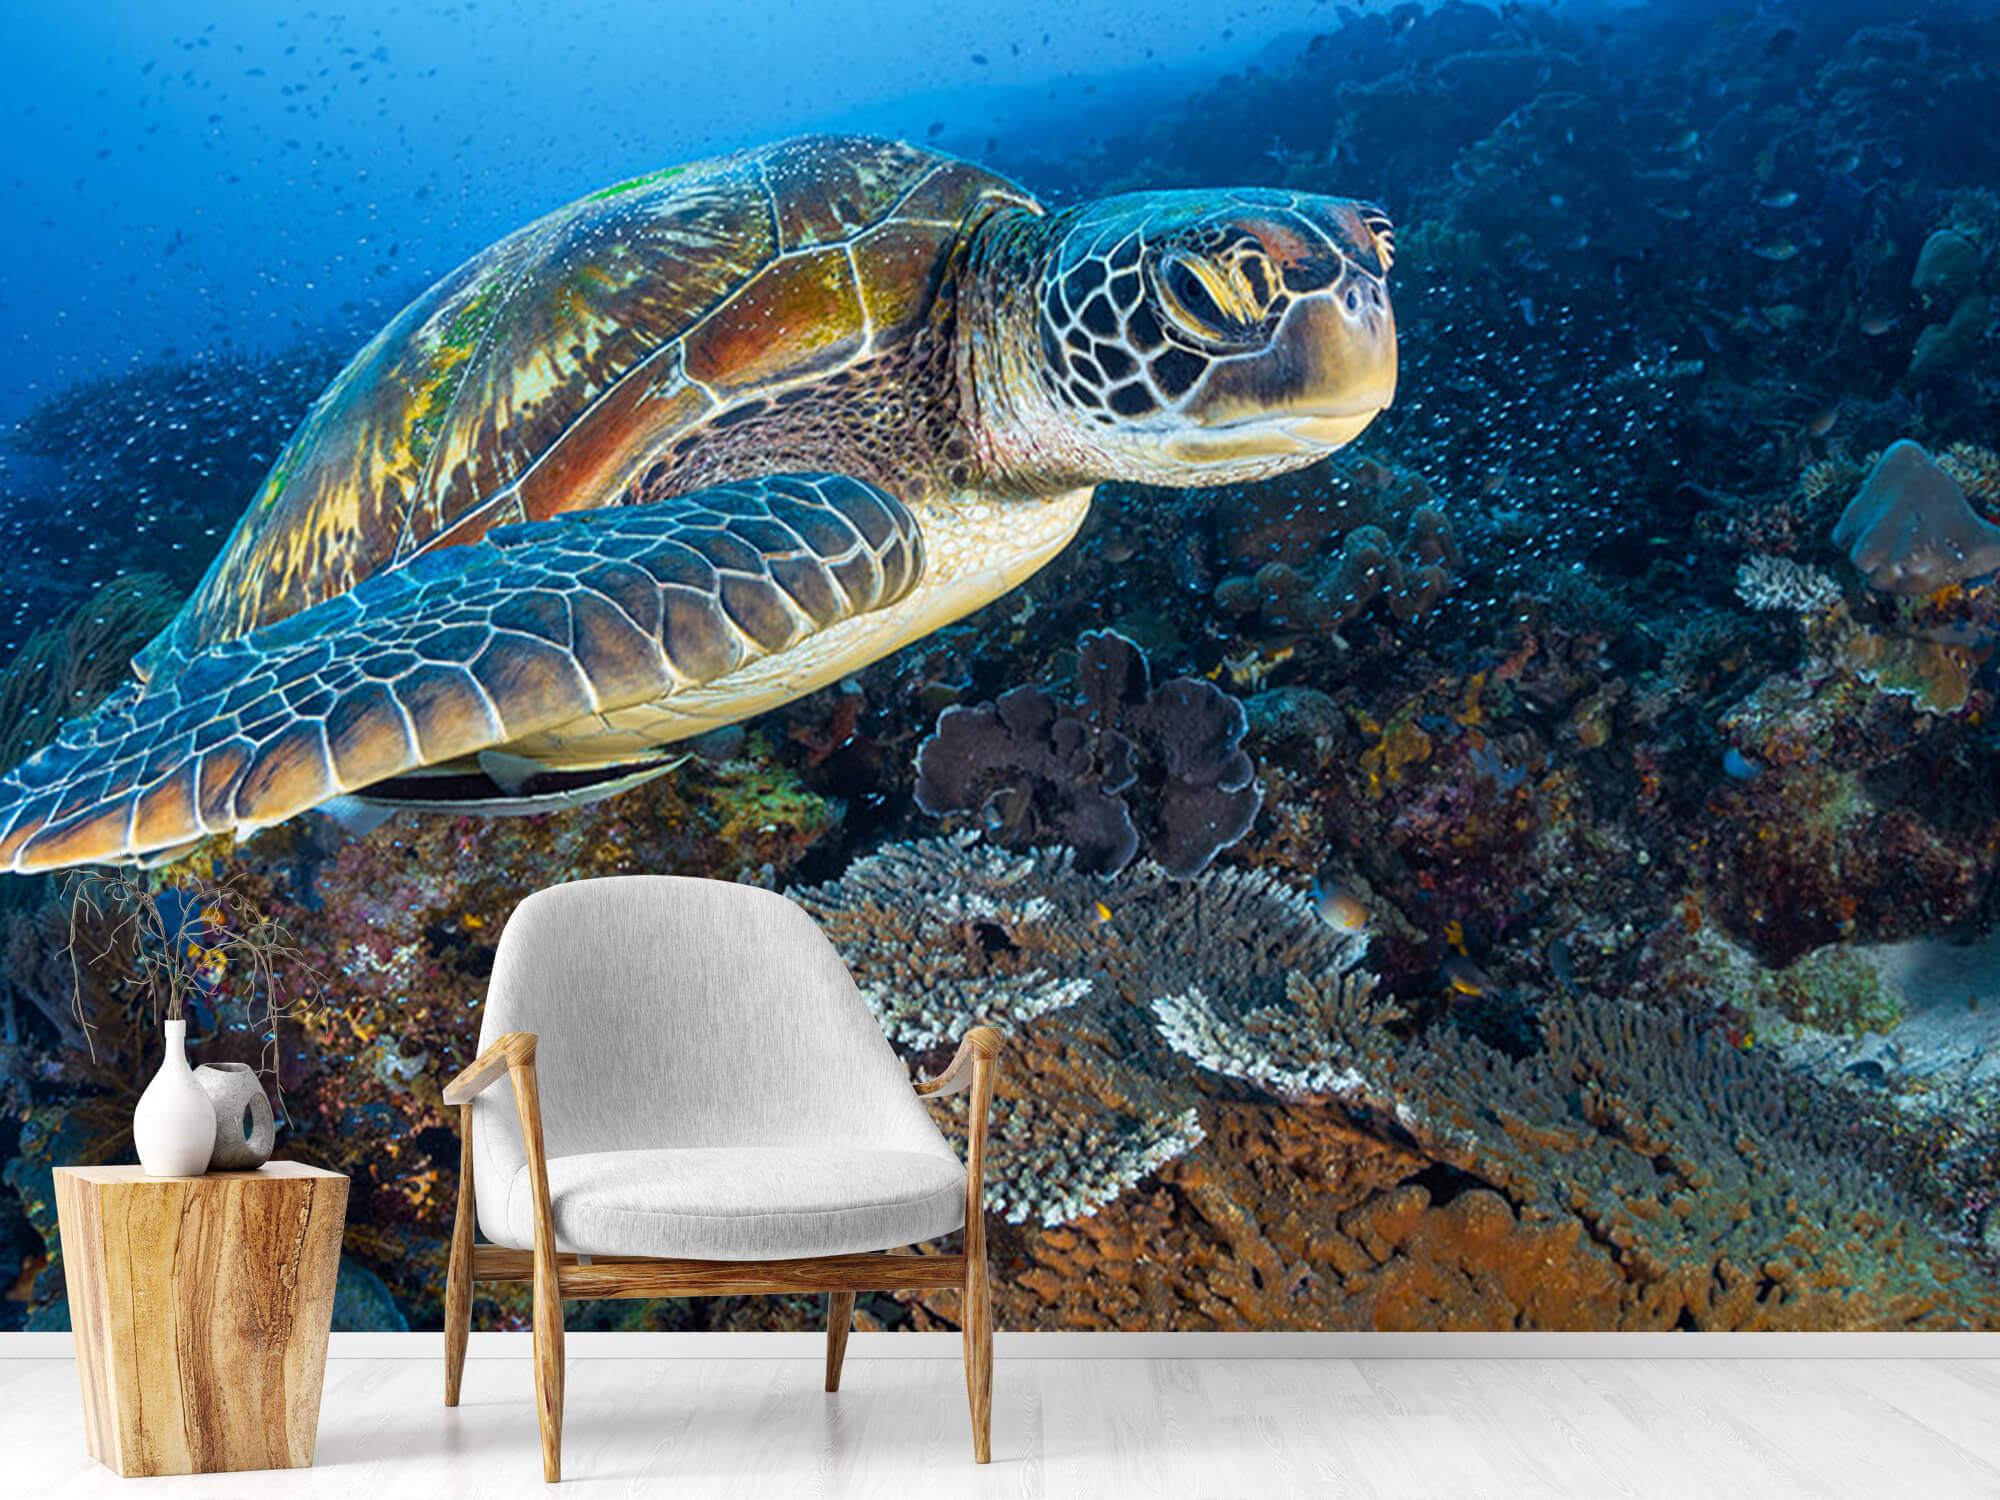 Green sea turtle from Raja Ampat 14